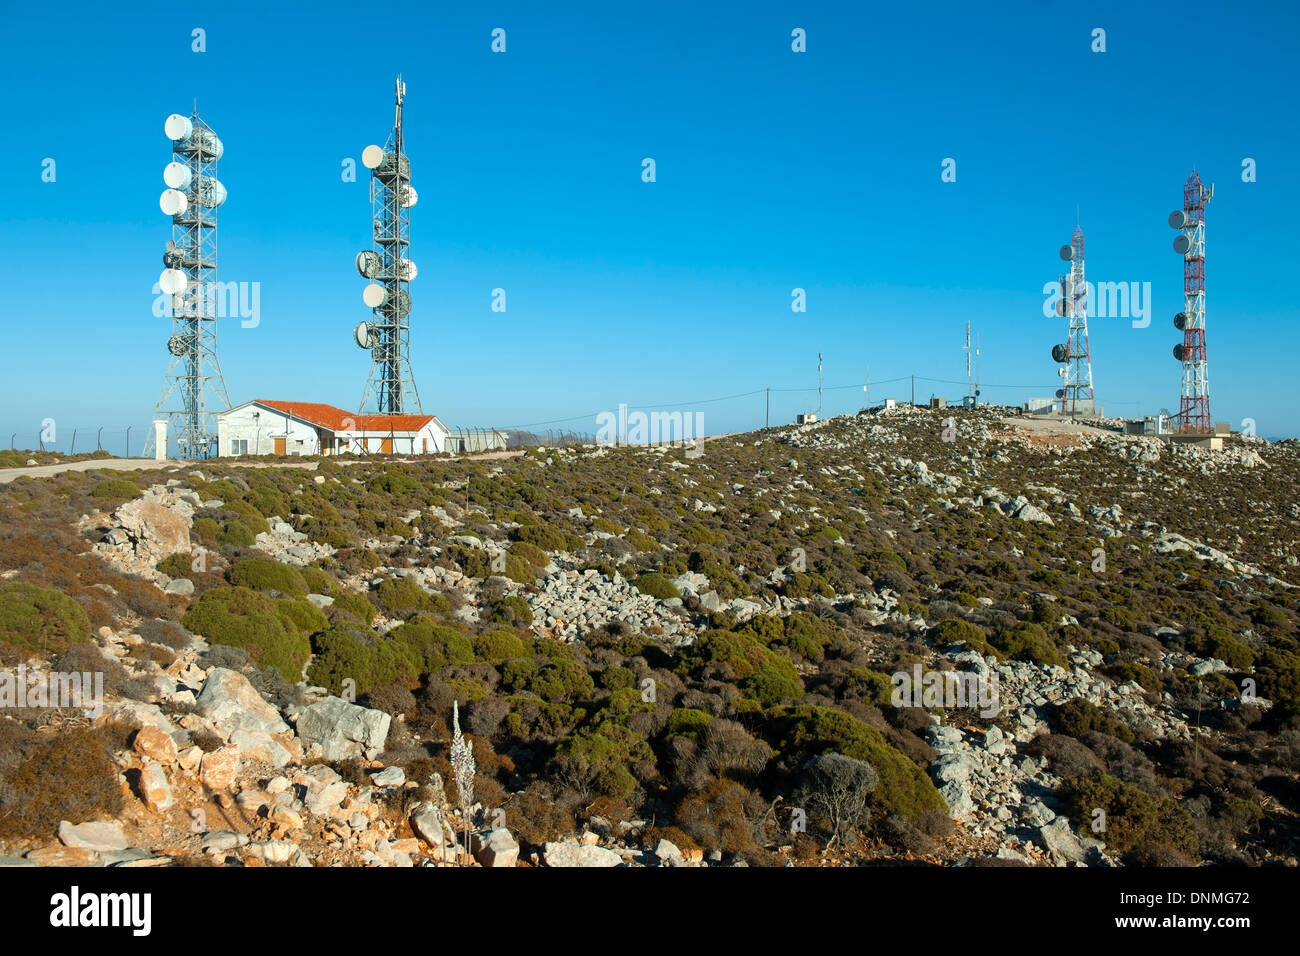 Griechenland, Insel Tilos, Fernmeldeantennen am Gipfel des 415 m hohen Berg Amali - Stock Image